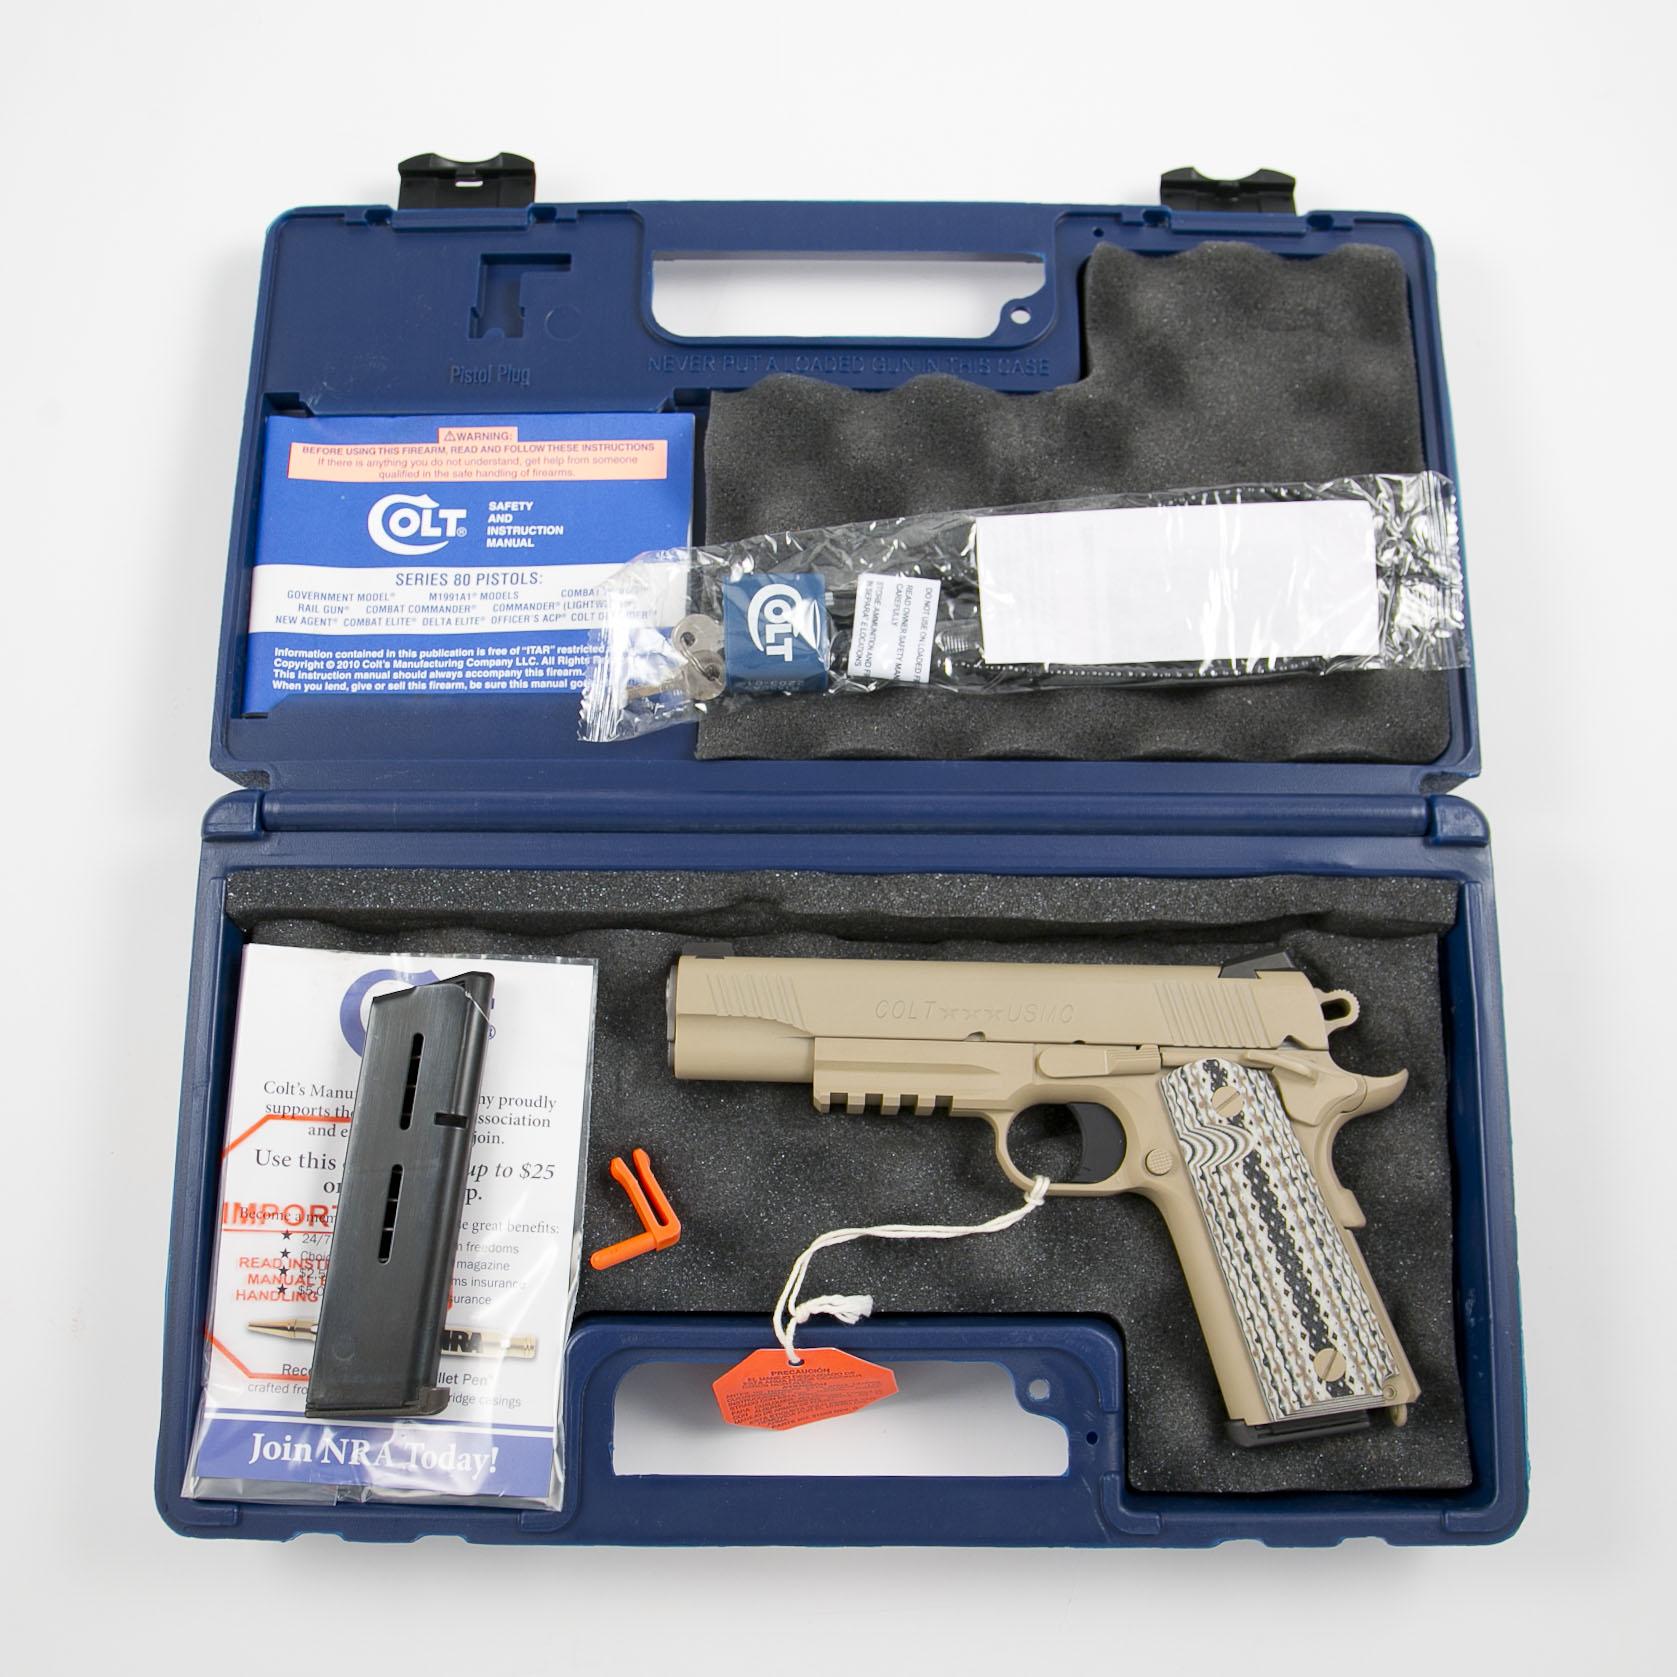 Colt - 1070M45 - Government Model w/Rail,